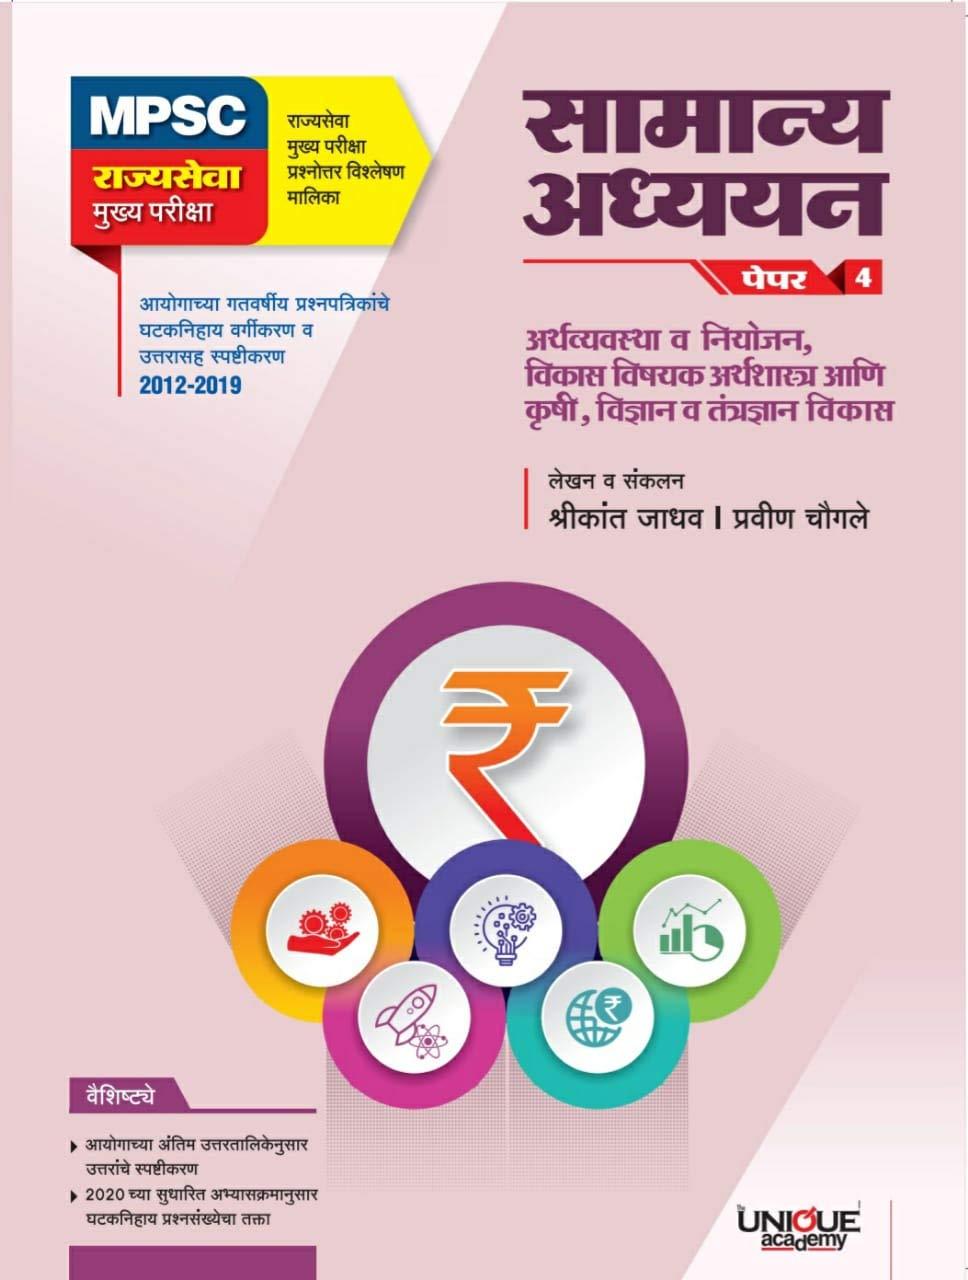 Samanya Adhayan gs paper 4 / सामान्य अध्ययन -4 (GS-4) / unique academy [Paperback] Shrikant Jadhav and Pravin Chougule